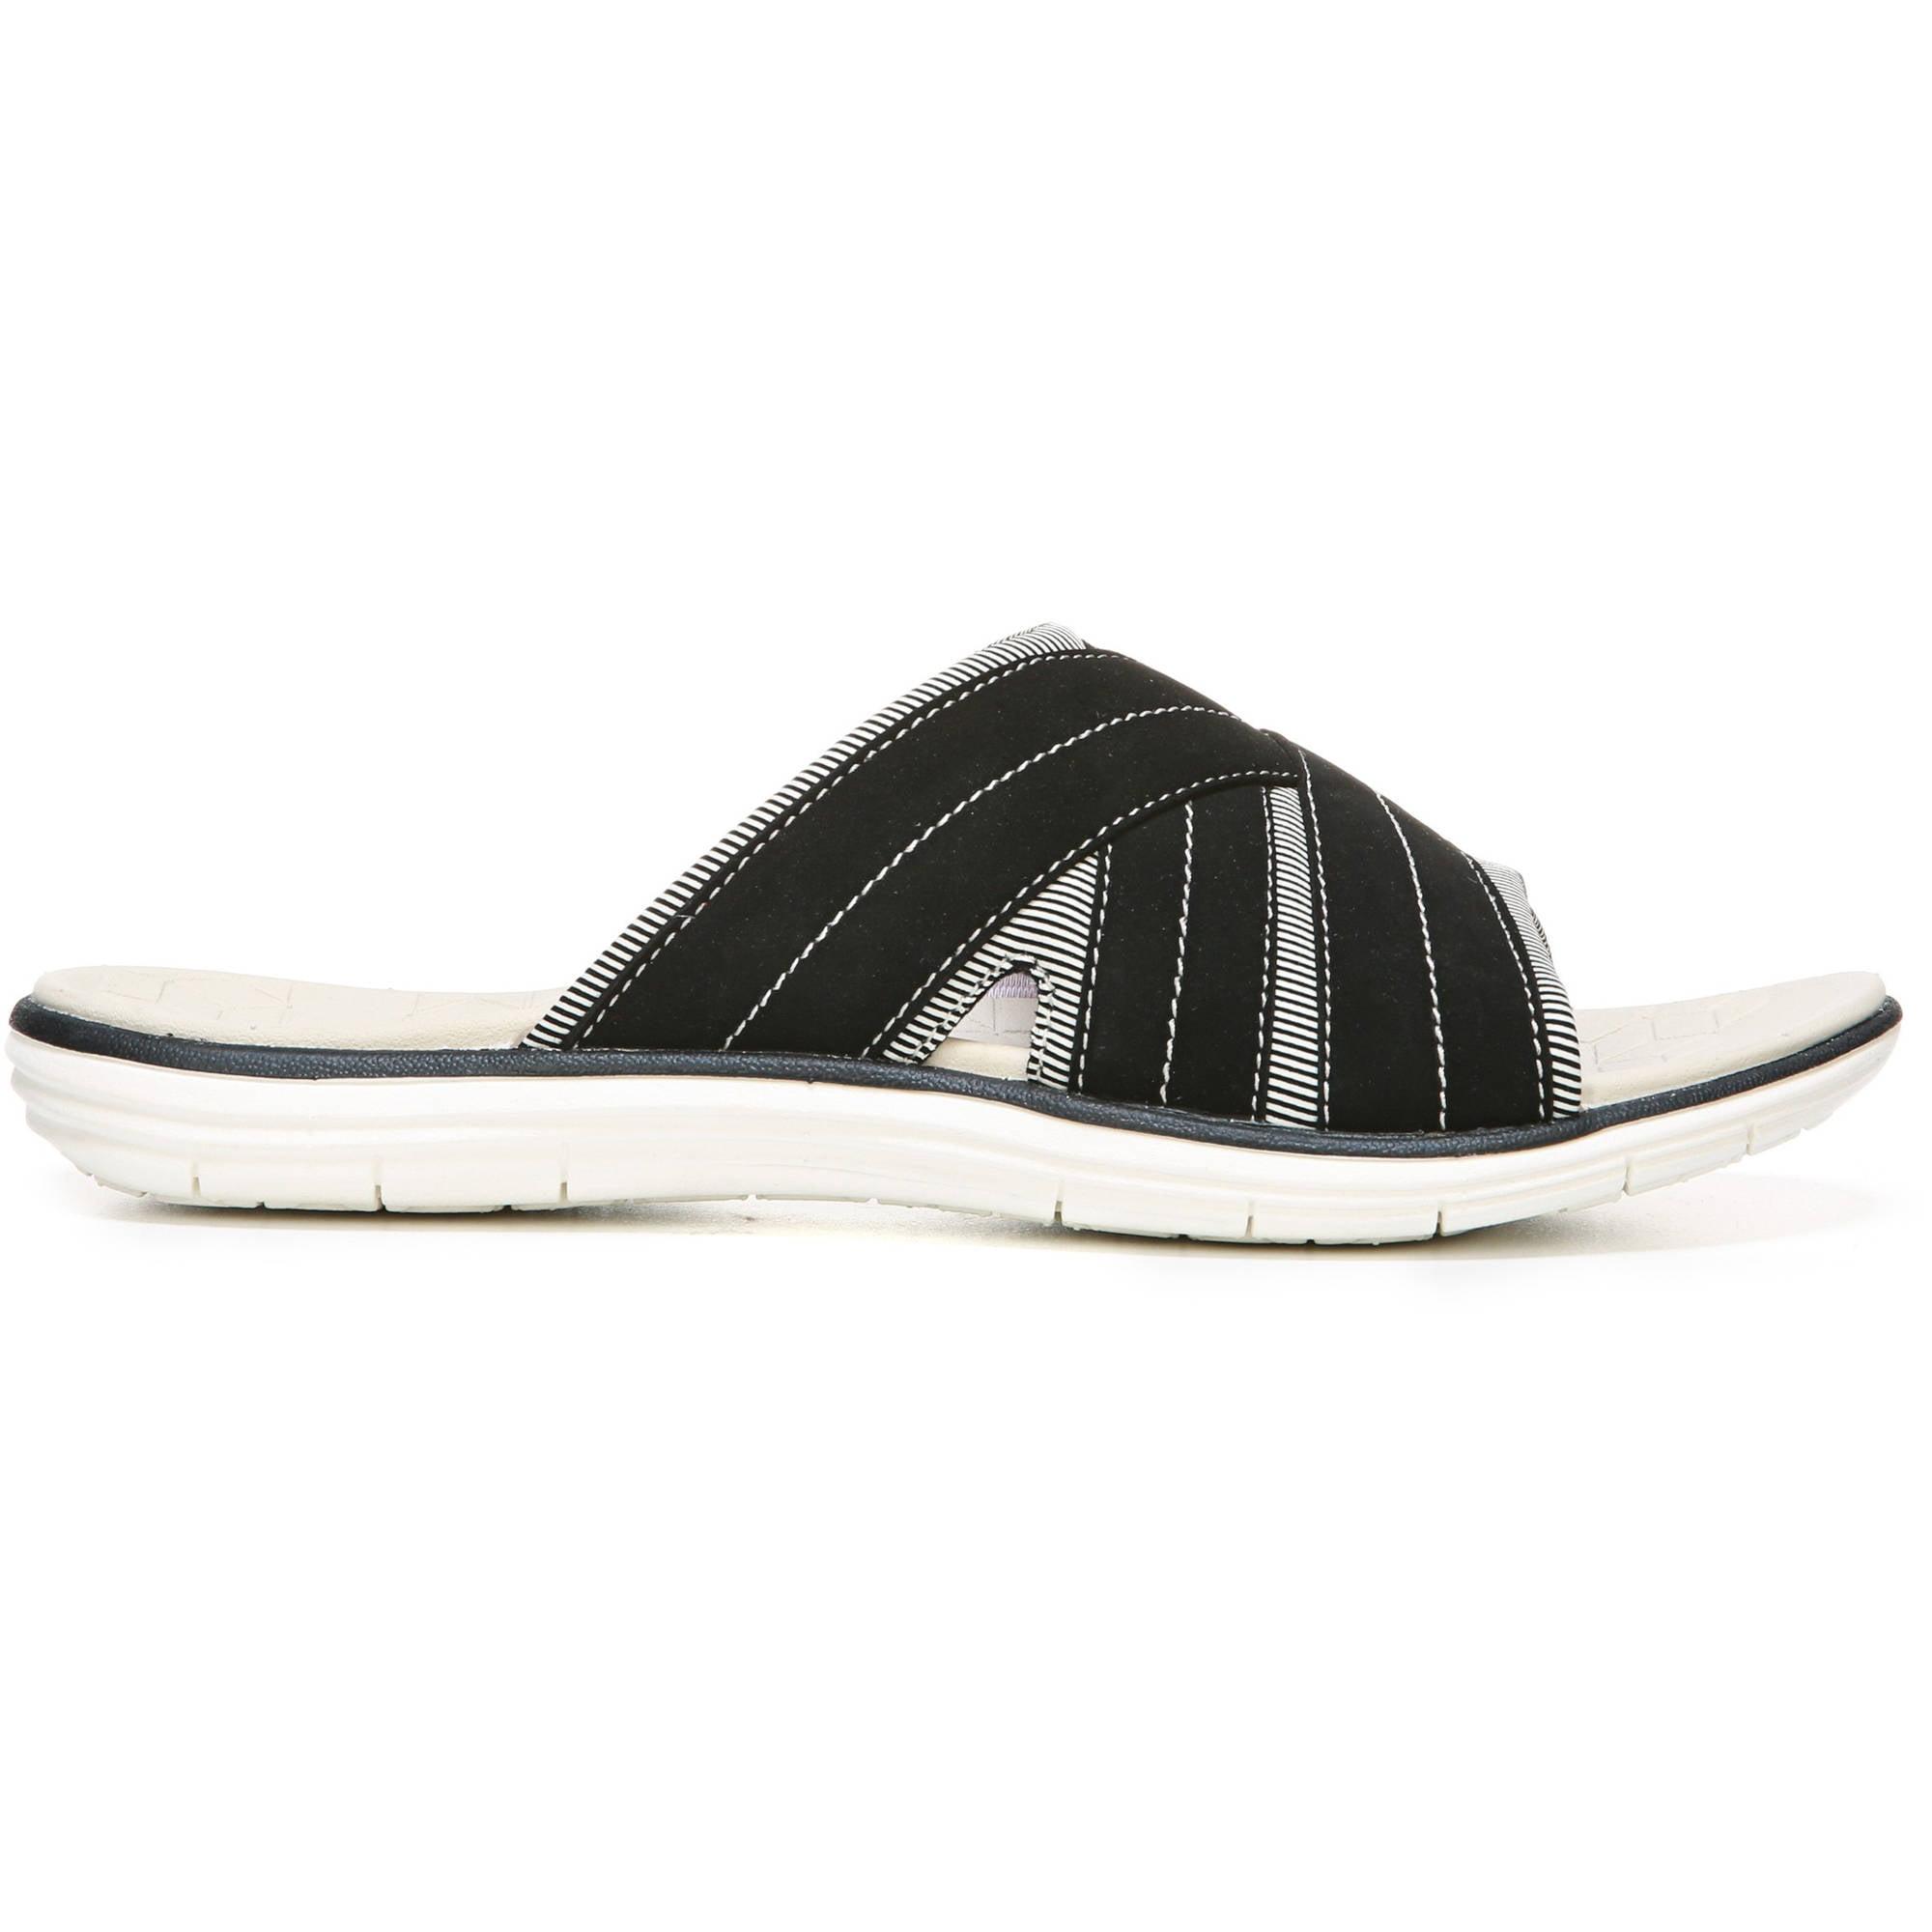 Womens sandals walmart - Womens Sandals Walmart 55